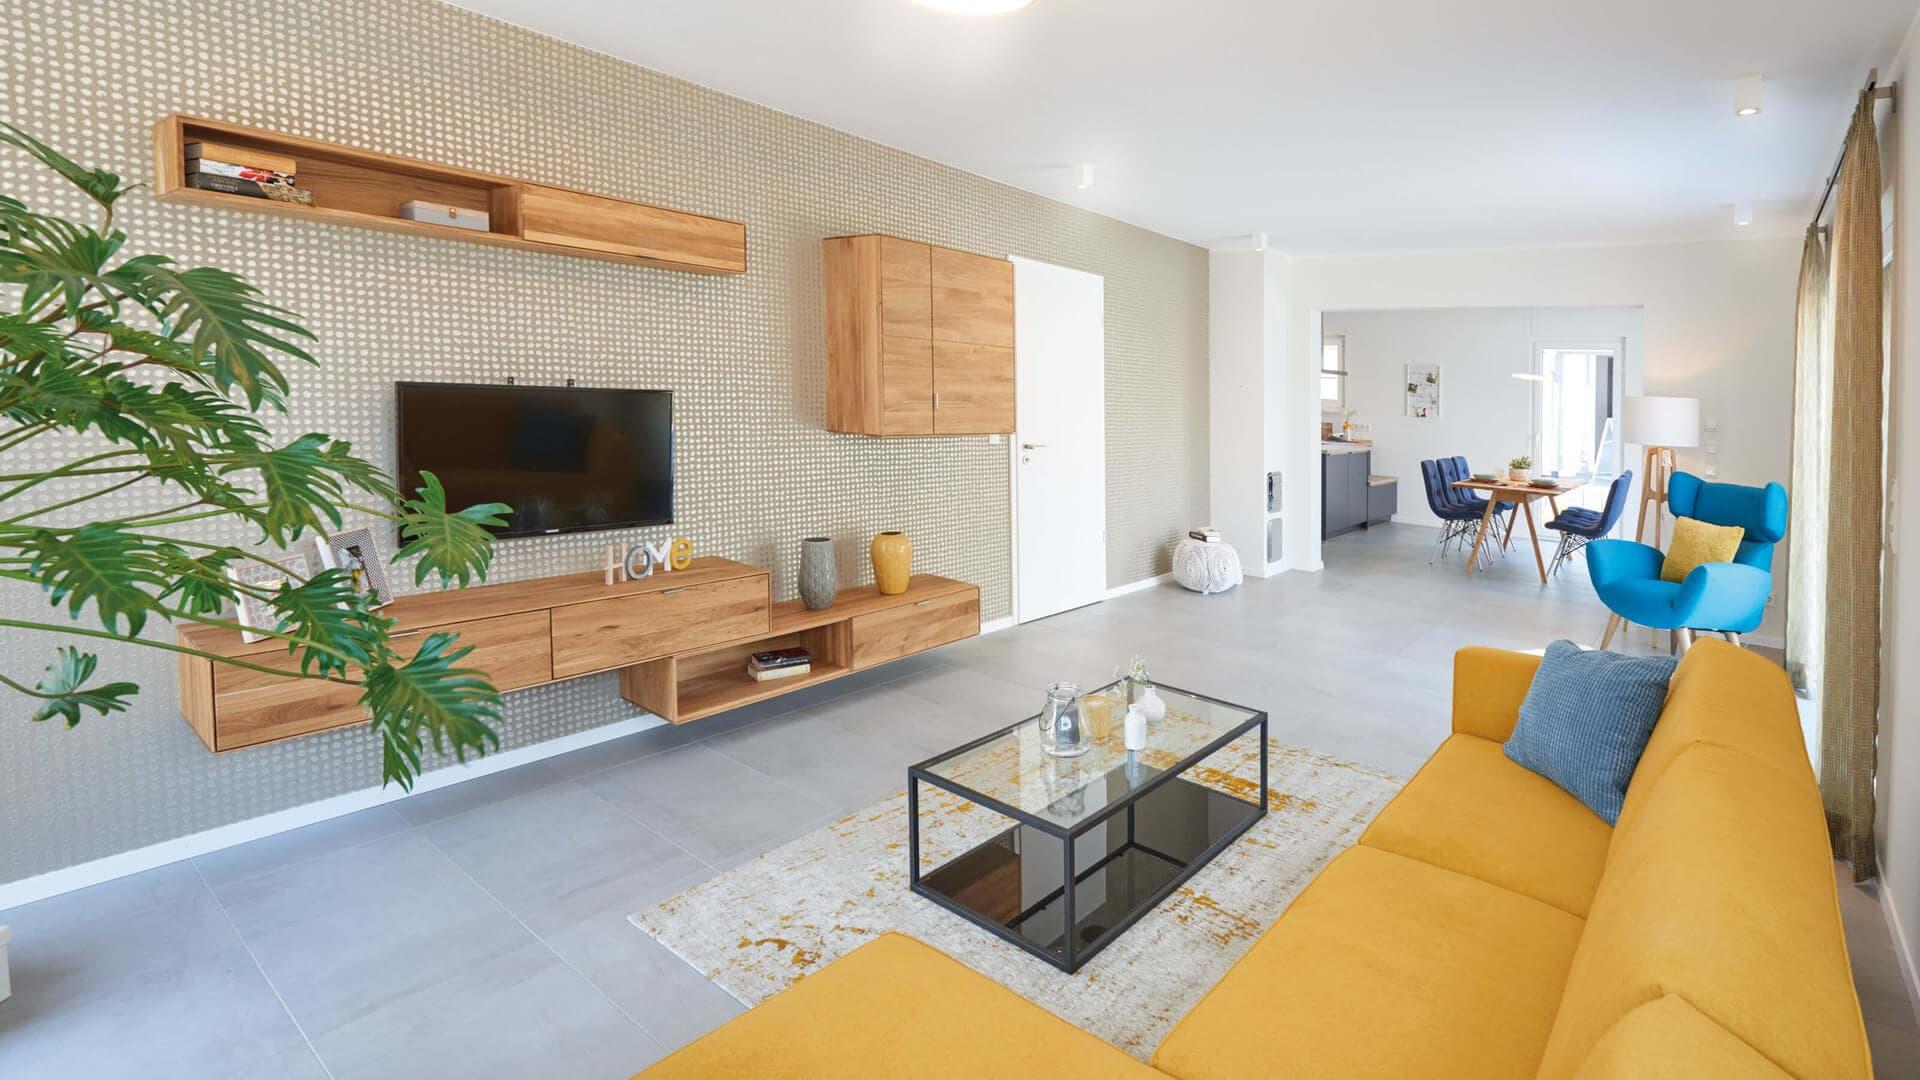 fingerhut haus musterhaus stuttgart fingerhut haus gmbh co kg anbieter. Black Bedroom Furniture Sets. Home Design Ideas